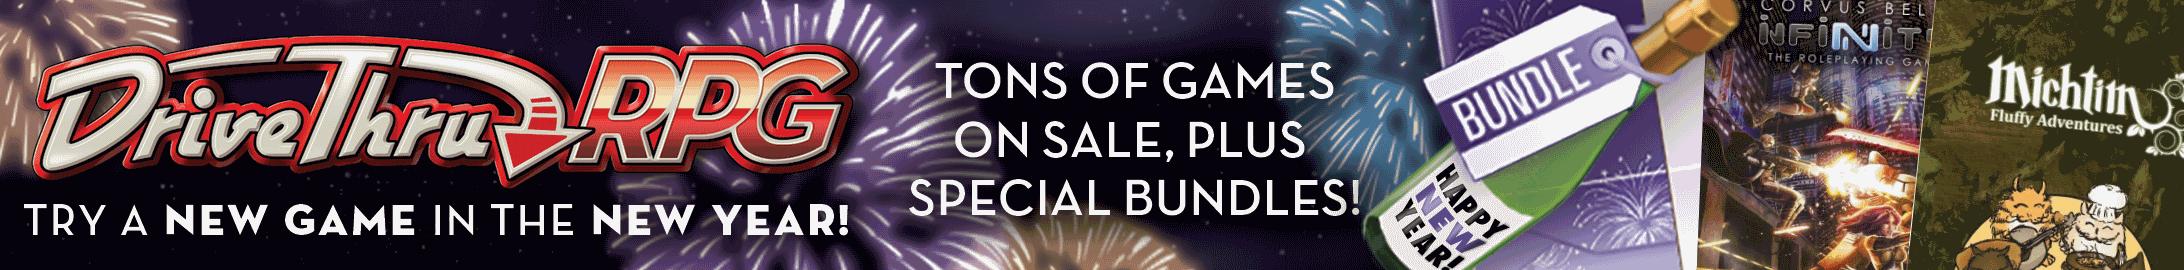 New Year, New Game sale @ DriveThruRPG.com